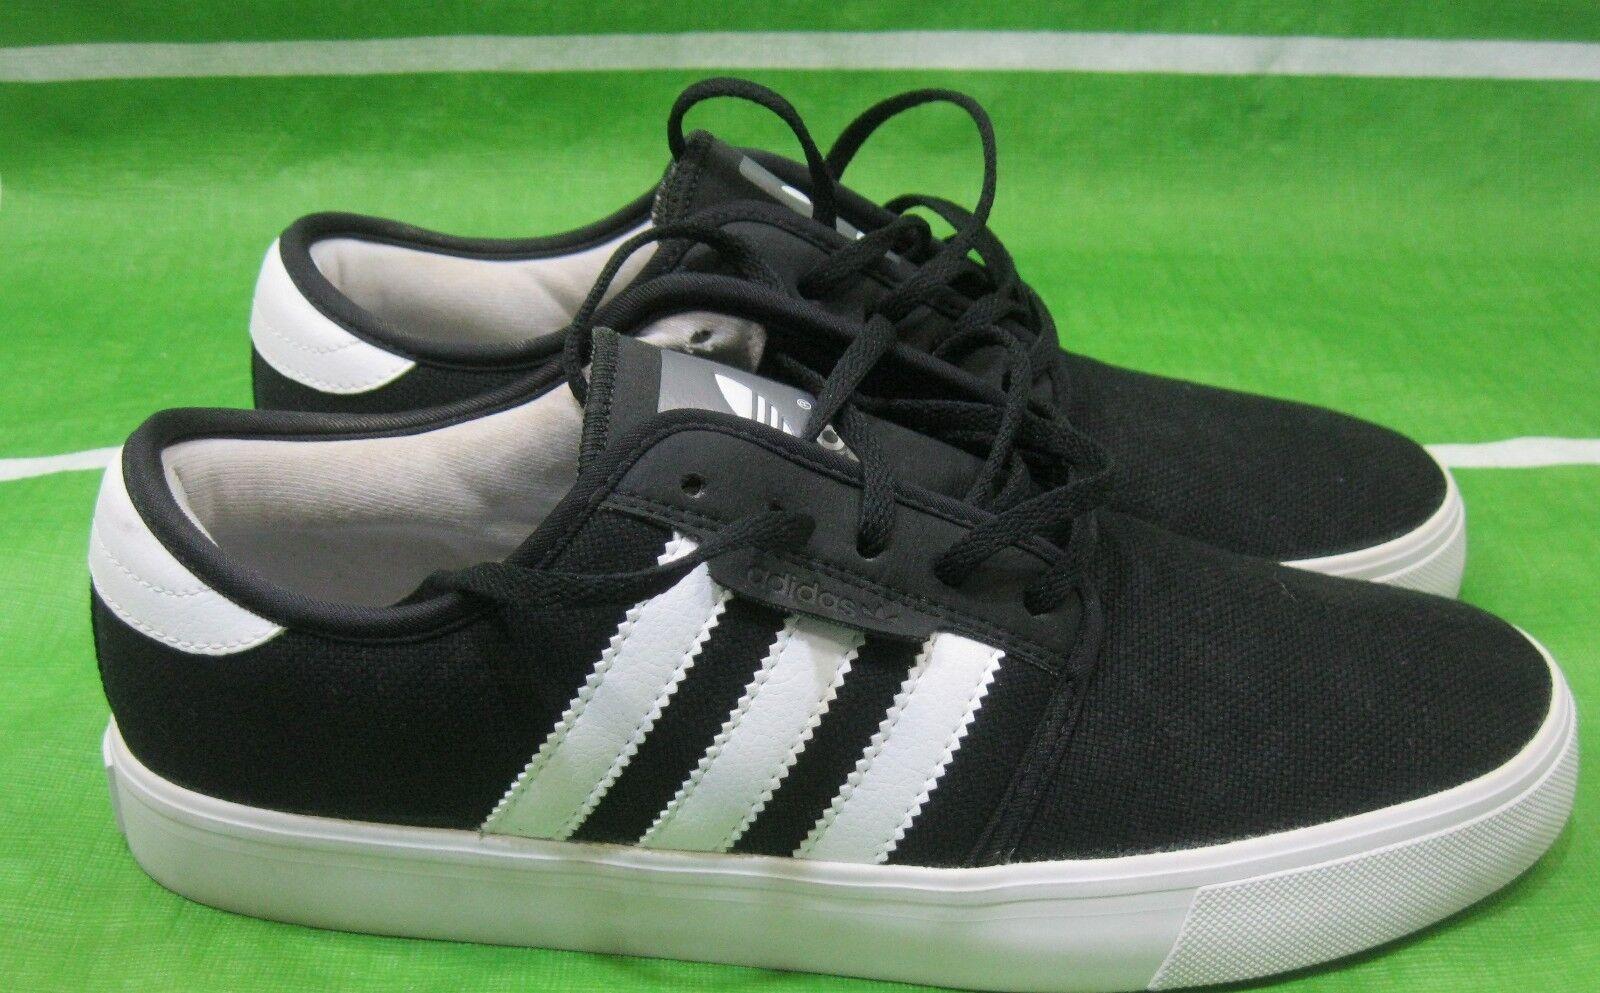 hot sales 0282d fce32 Adidas Adidas Adidas Originals Homme Seeley Toile Basket, G23703,  Noir Blanc Taille 8 16a9de